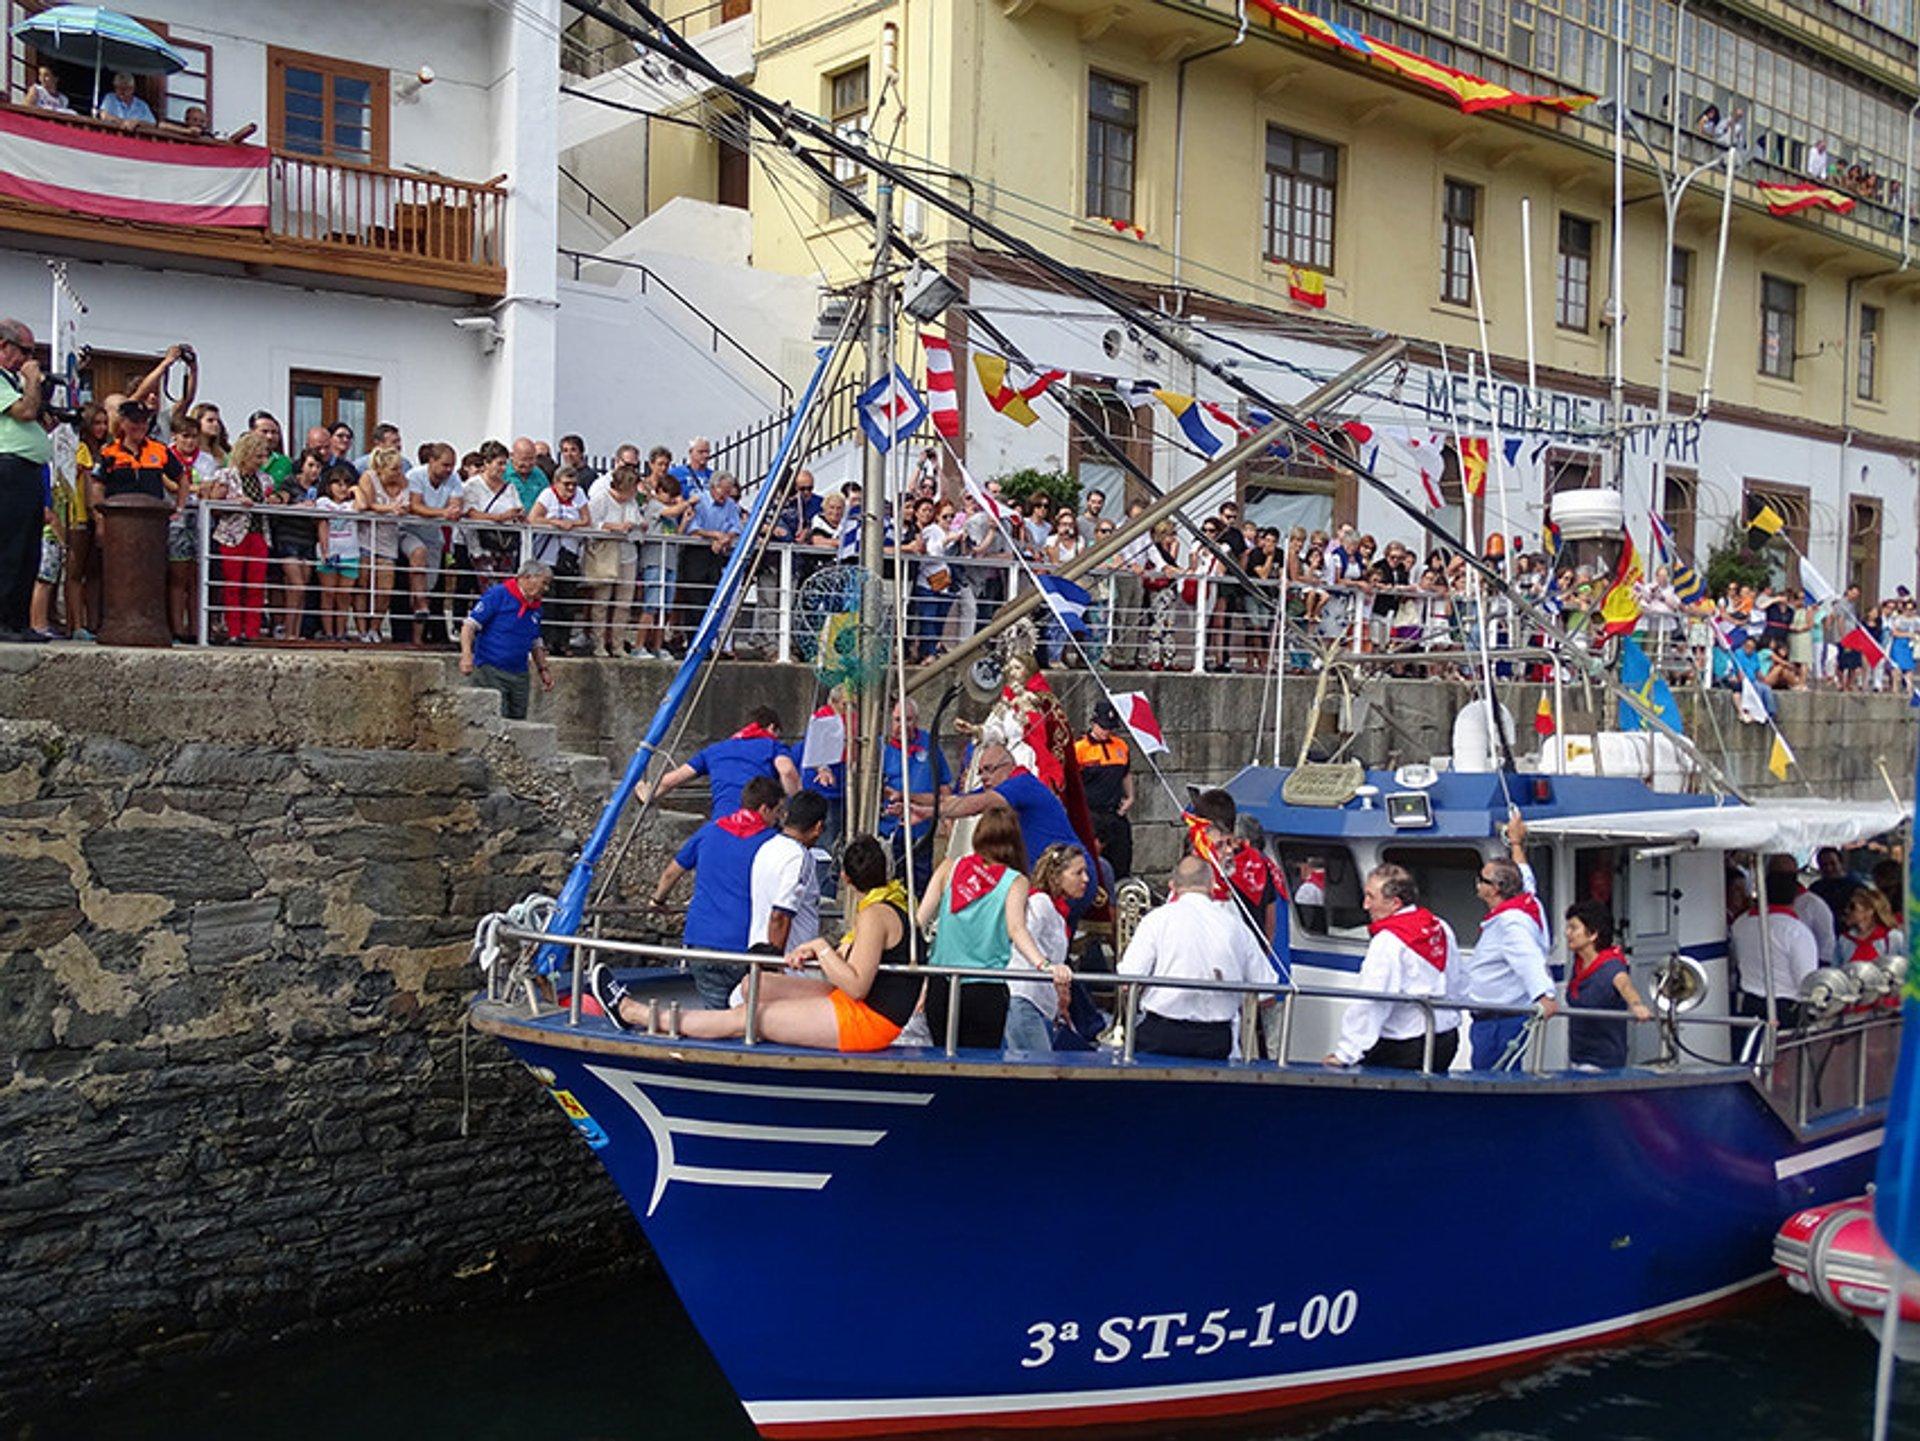 Luarca Maritime Procession of Virgen del Rosario in Spain 2020 - Best Time